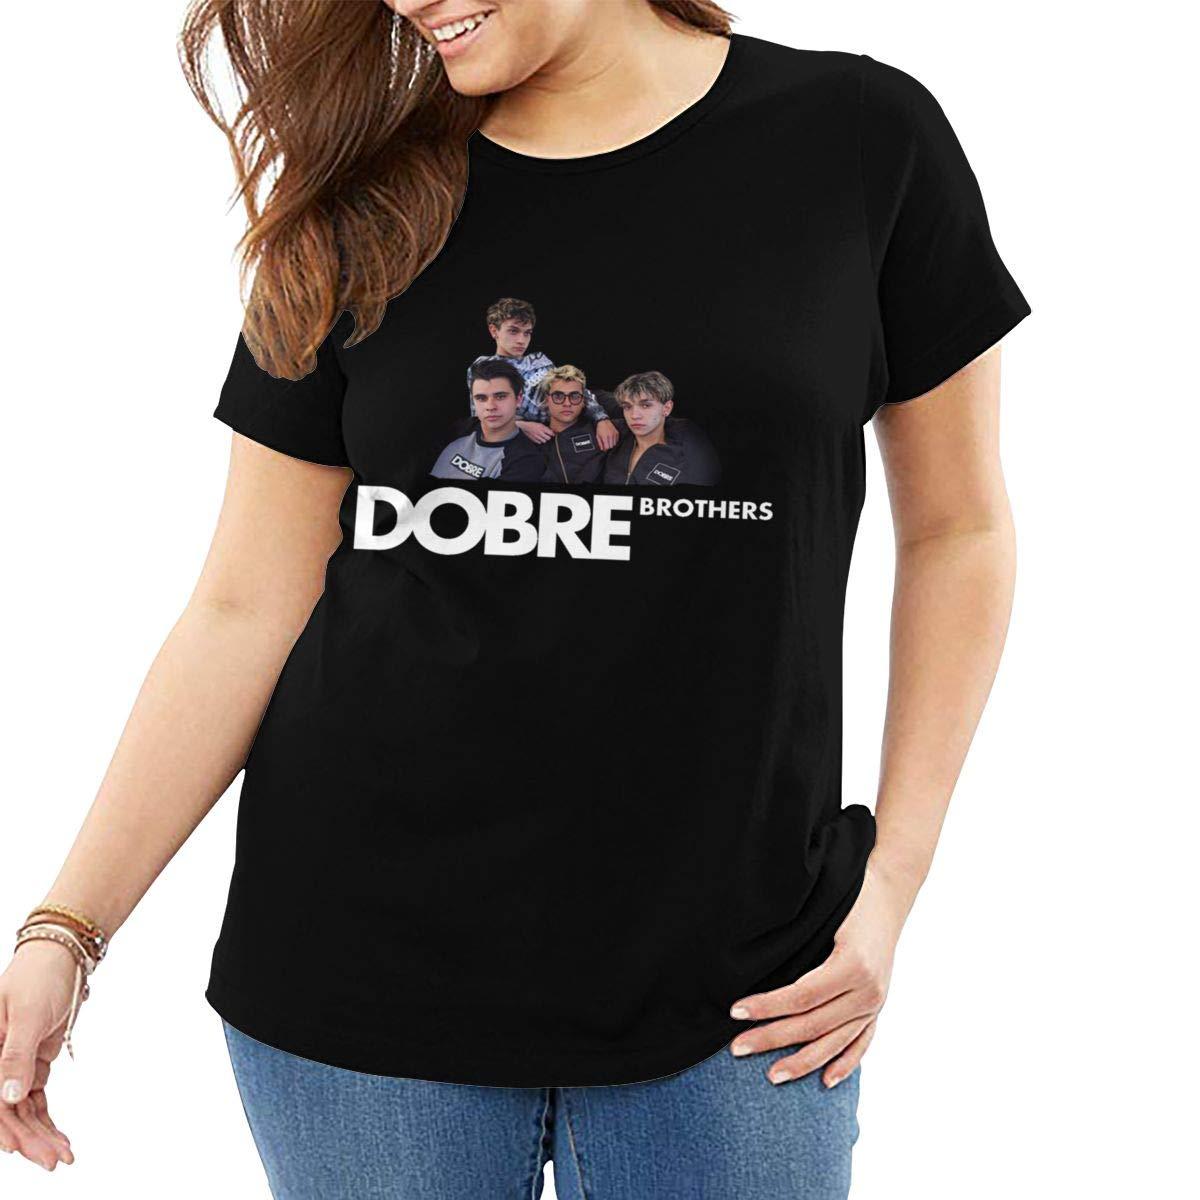 Fat Women's T Shirt Dobre Brothers Tee Shirts T-Shirt Short-Sleeve Round Neck Tshirt for Women Youth Girls Plus Size Black XL by BKashy